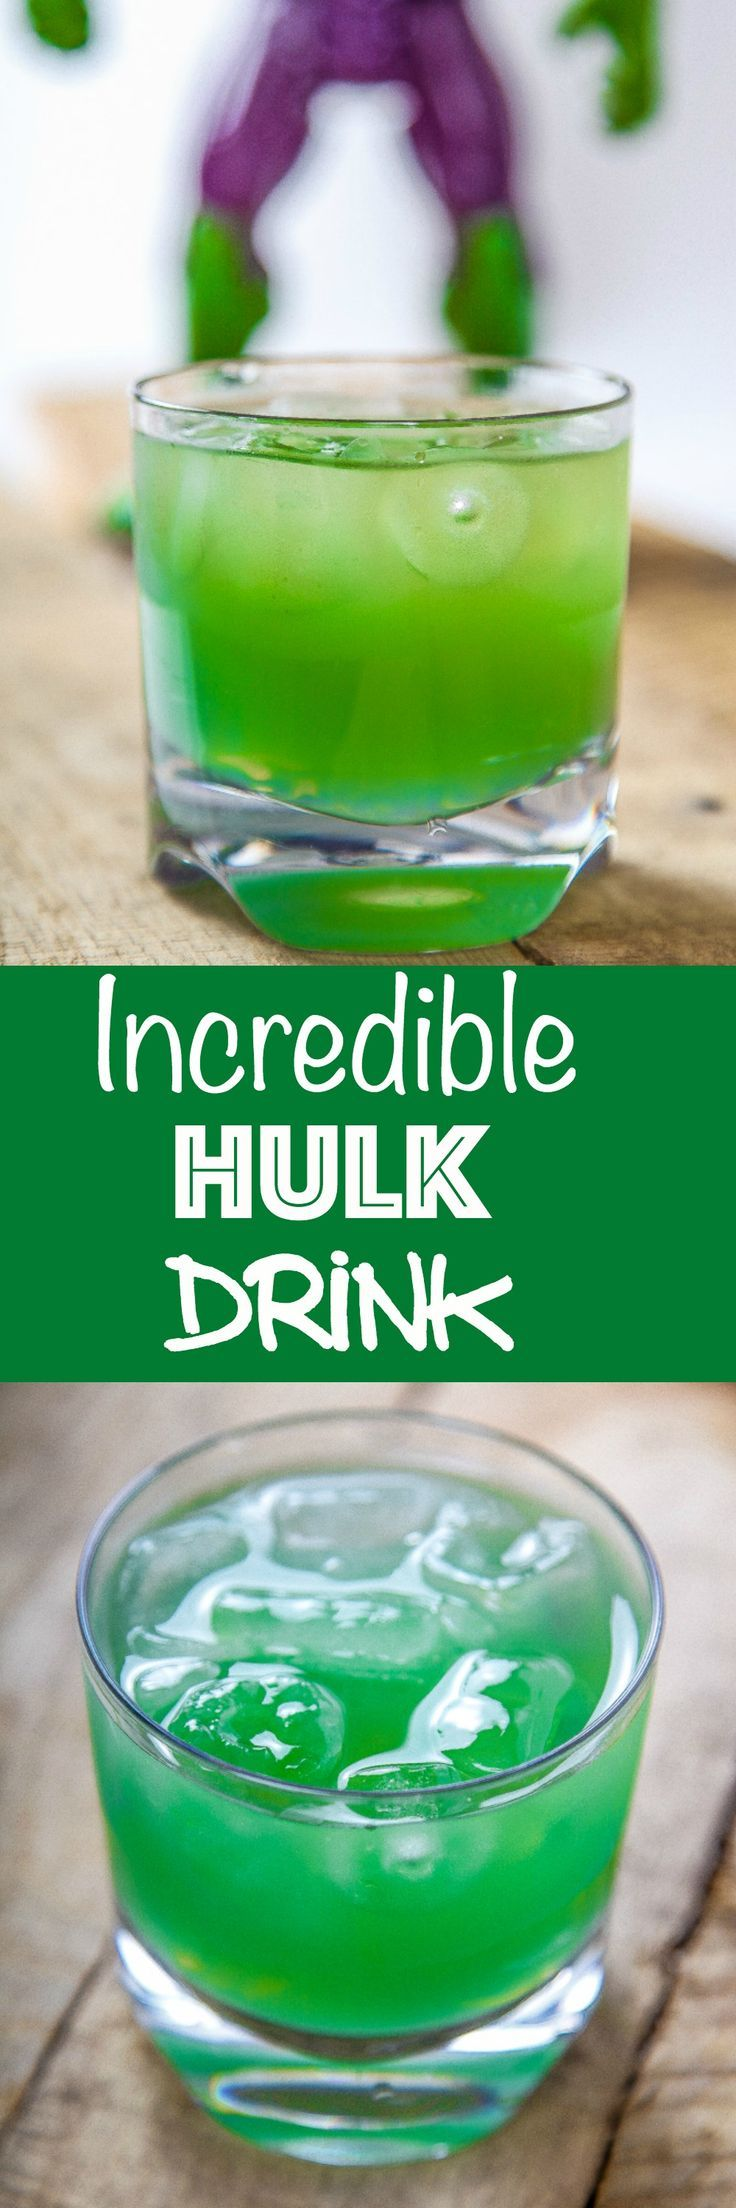 Incredible Hulk Drink in 2020   Incredible hulk drink ...